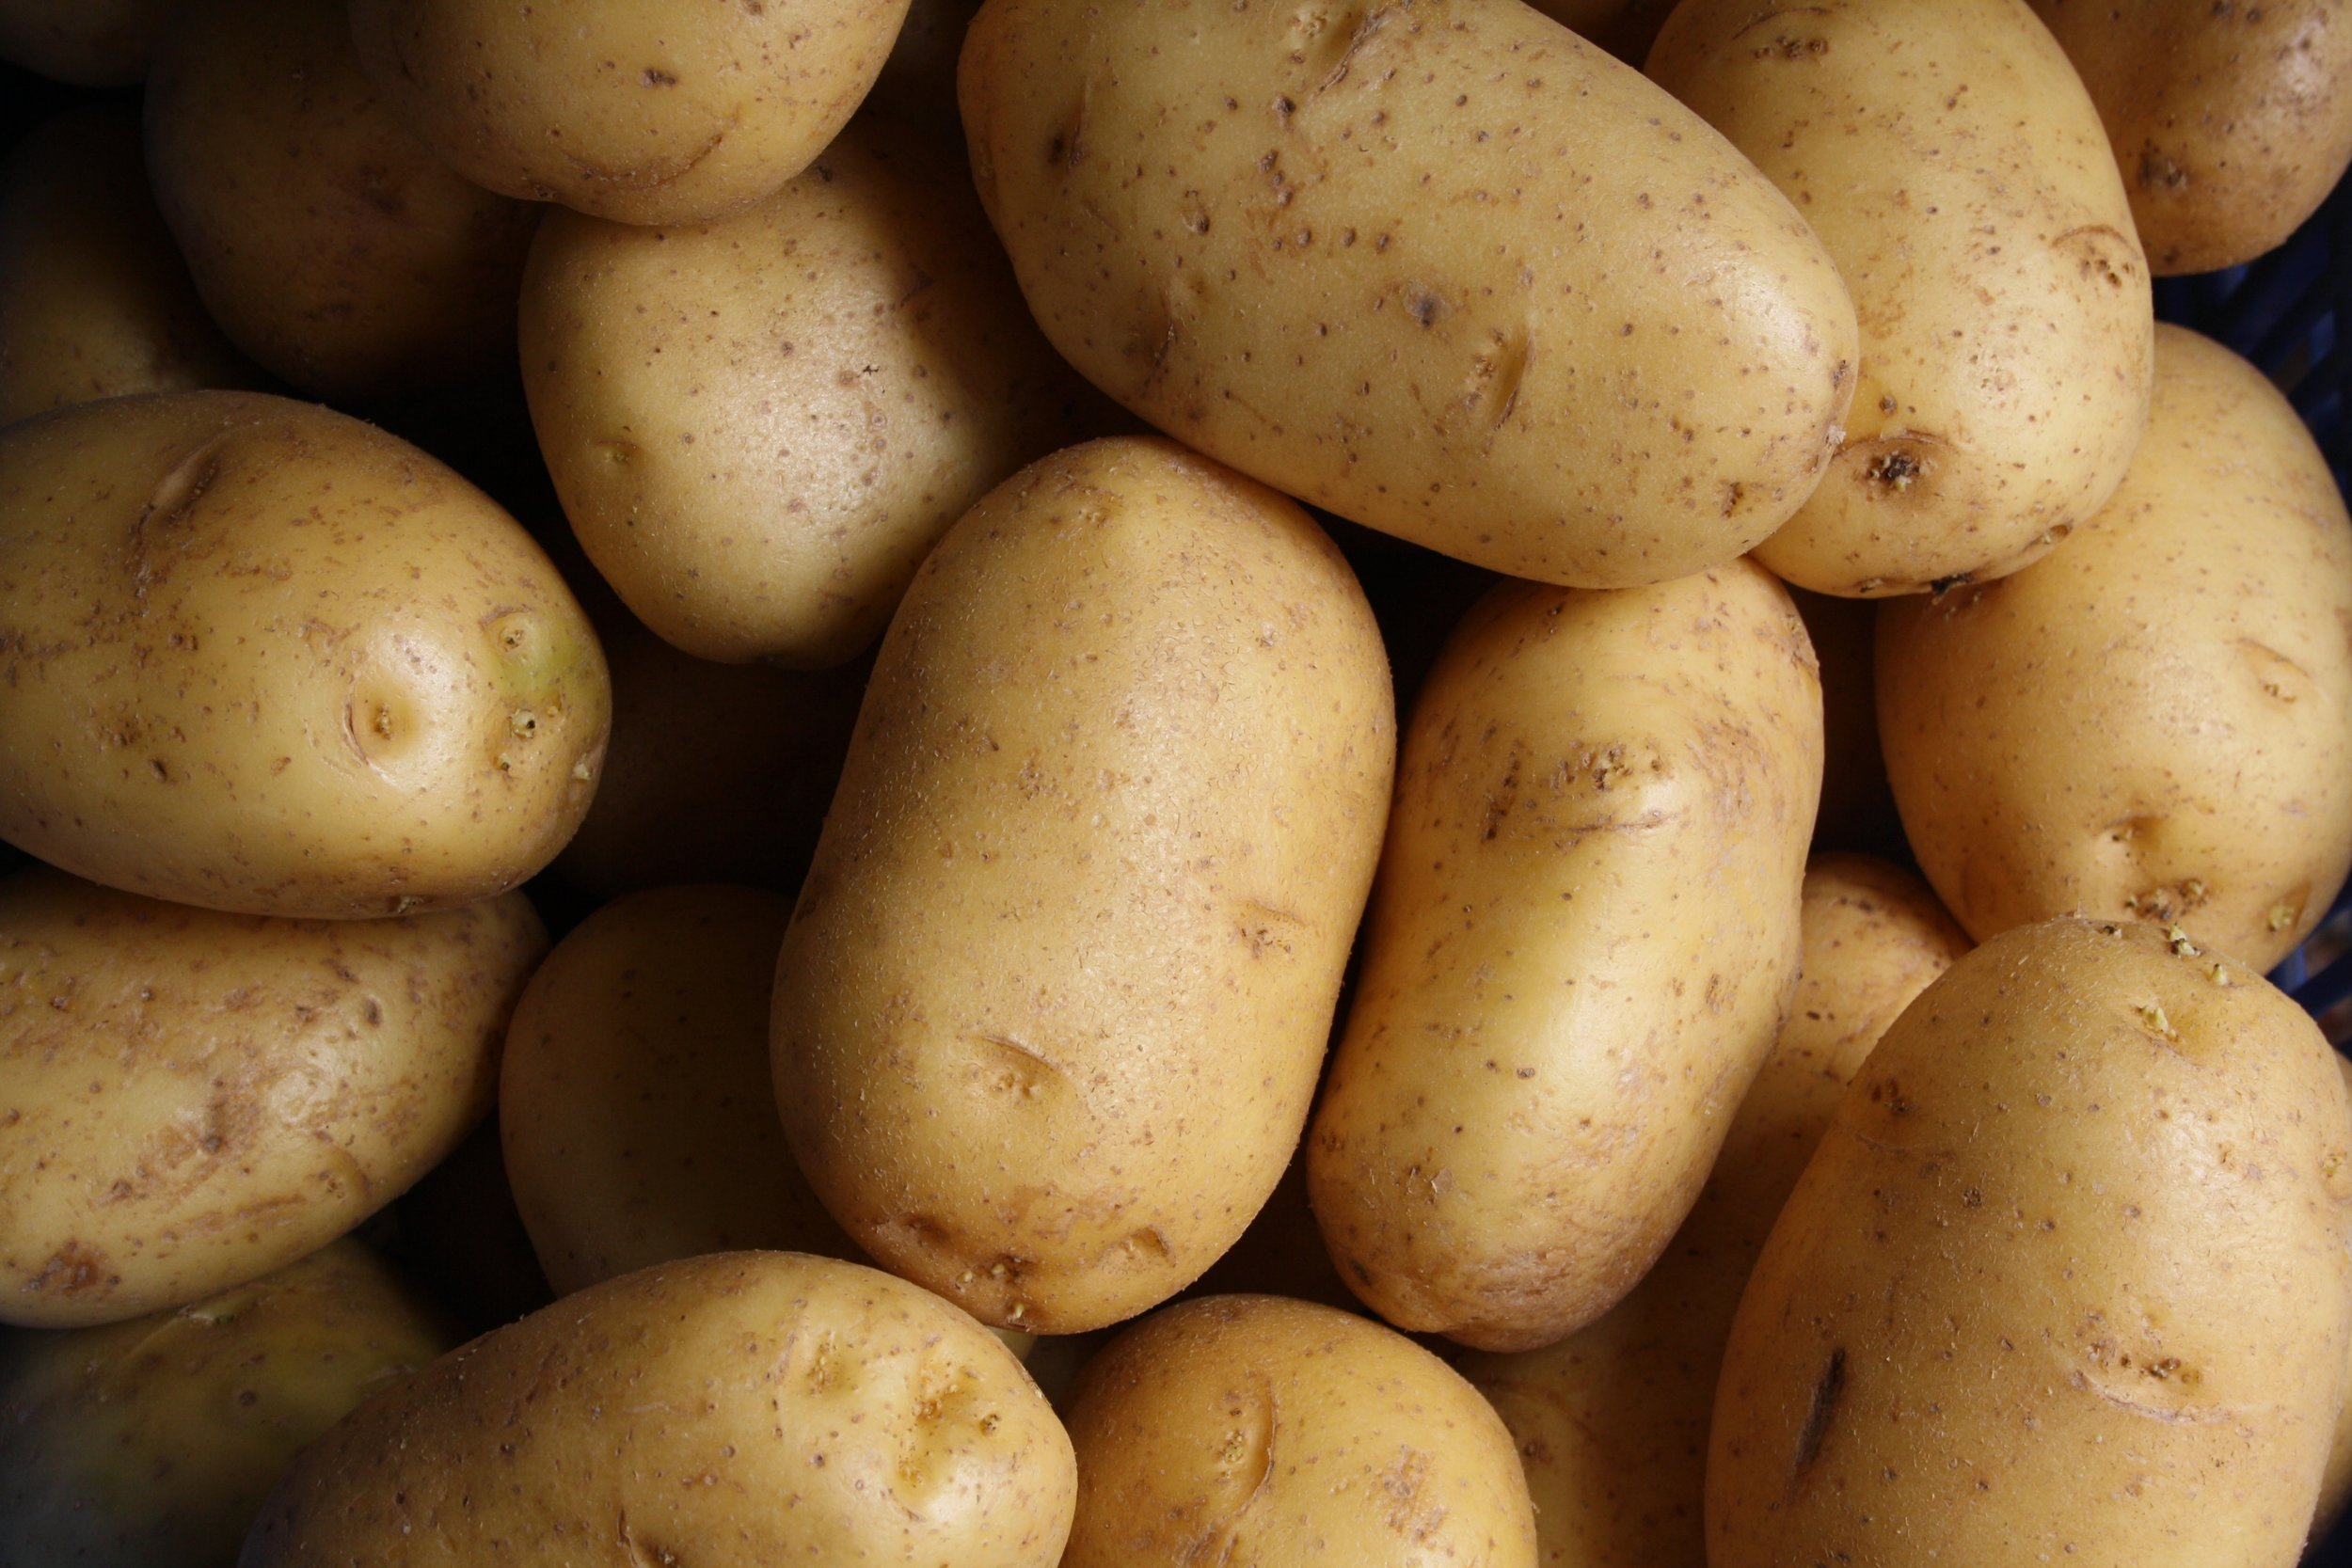 12. Potatoes -